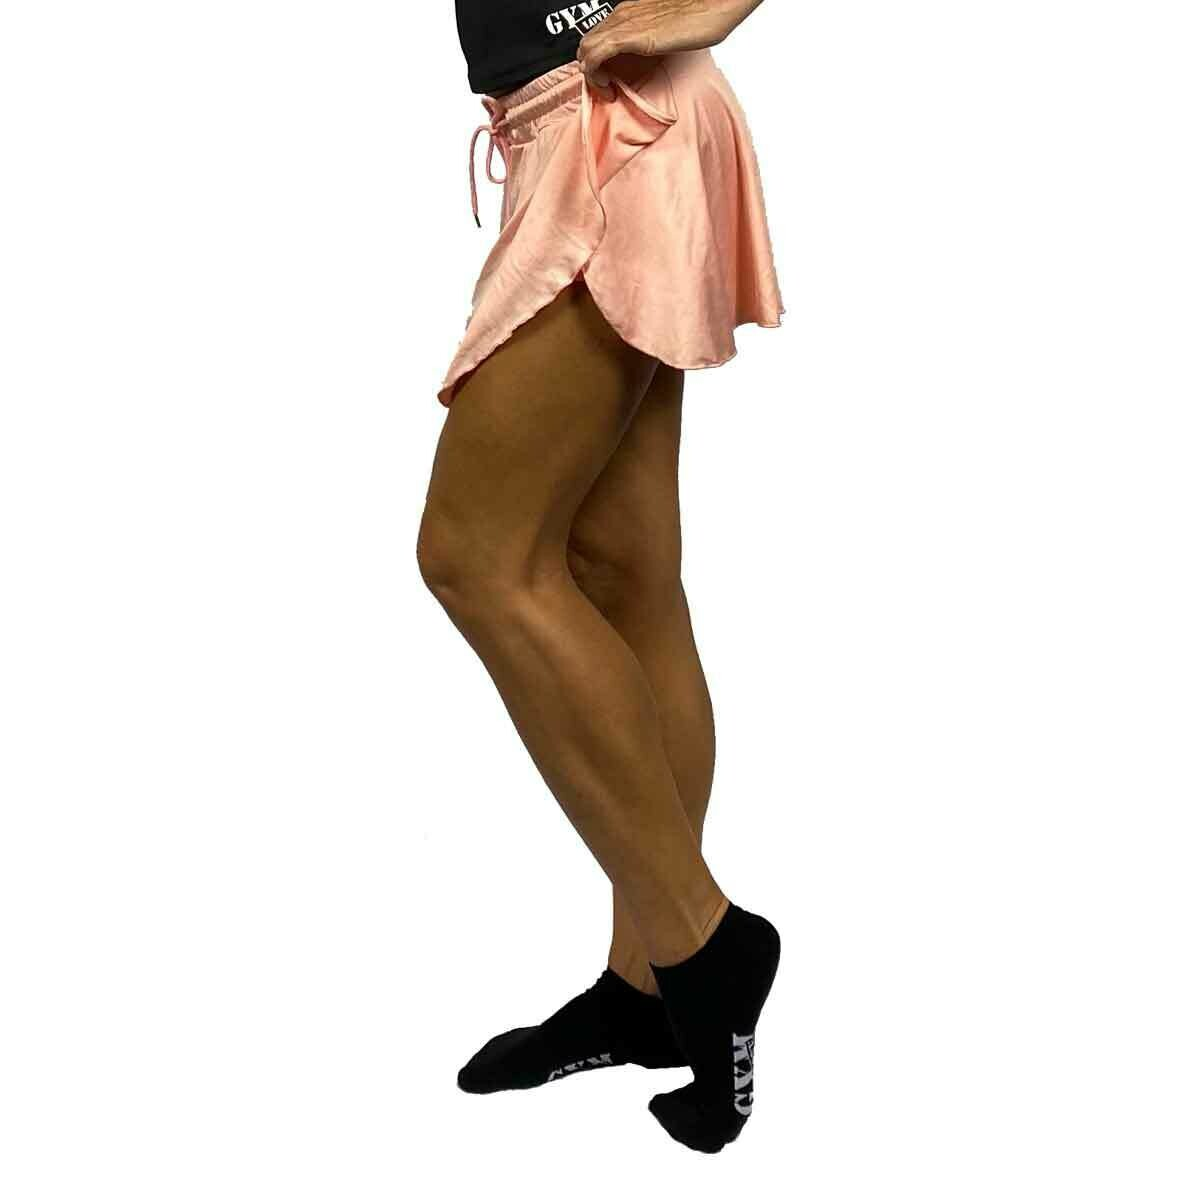 GymLove Skirt-Short Lachs